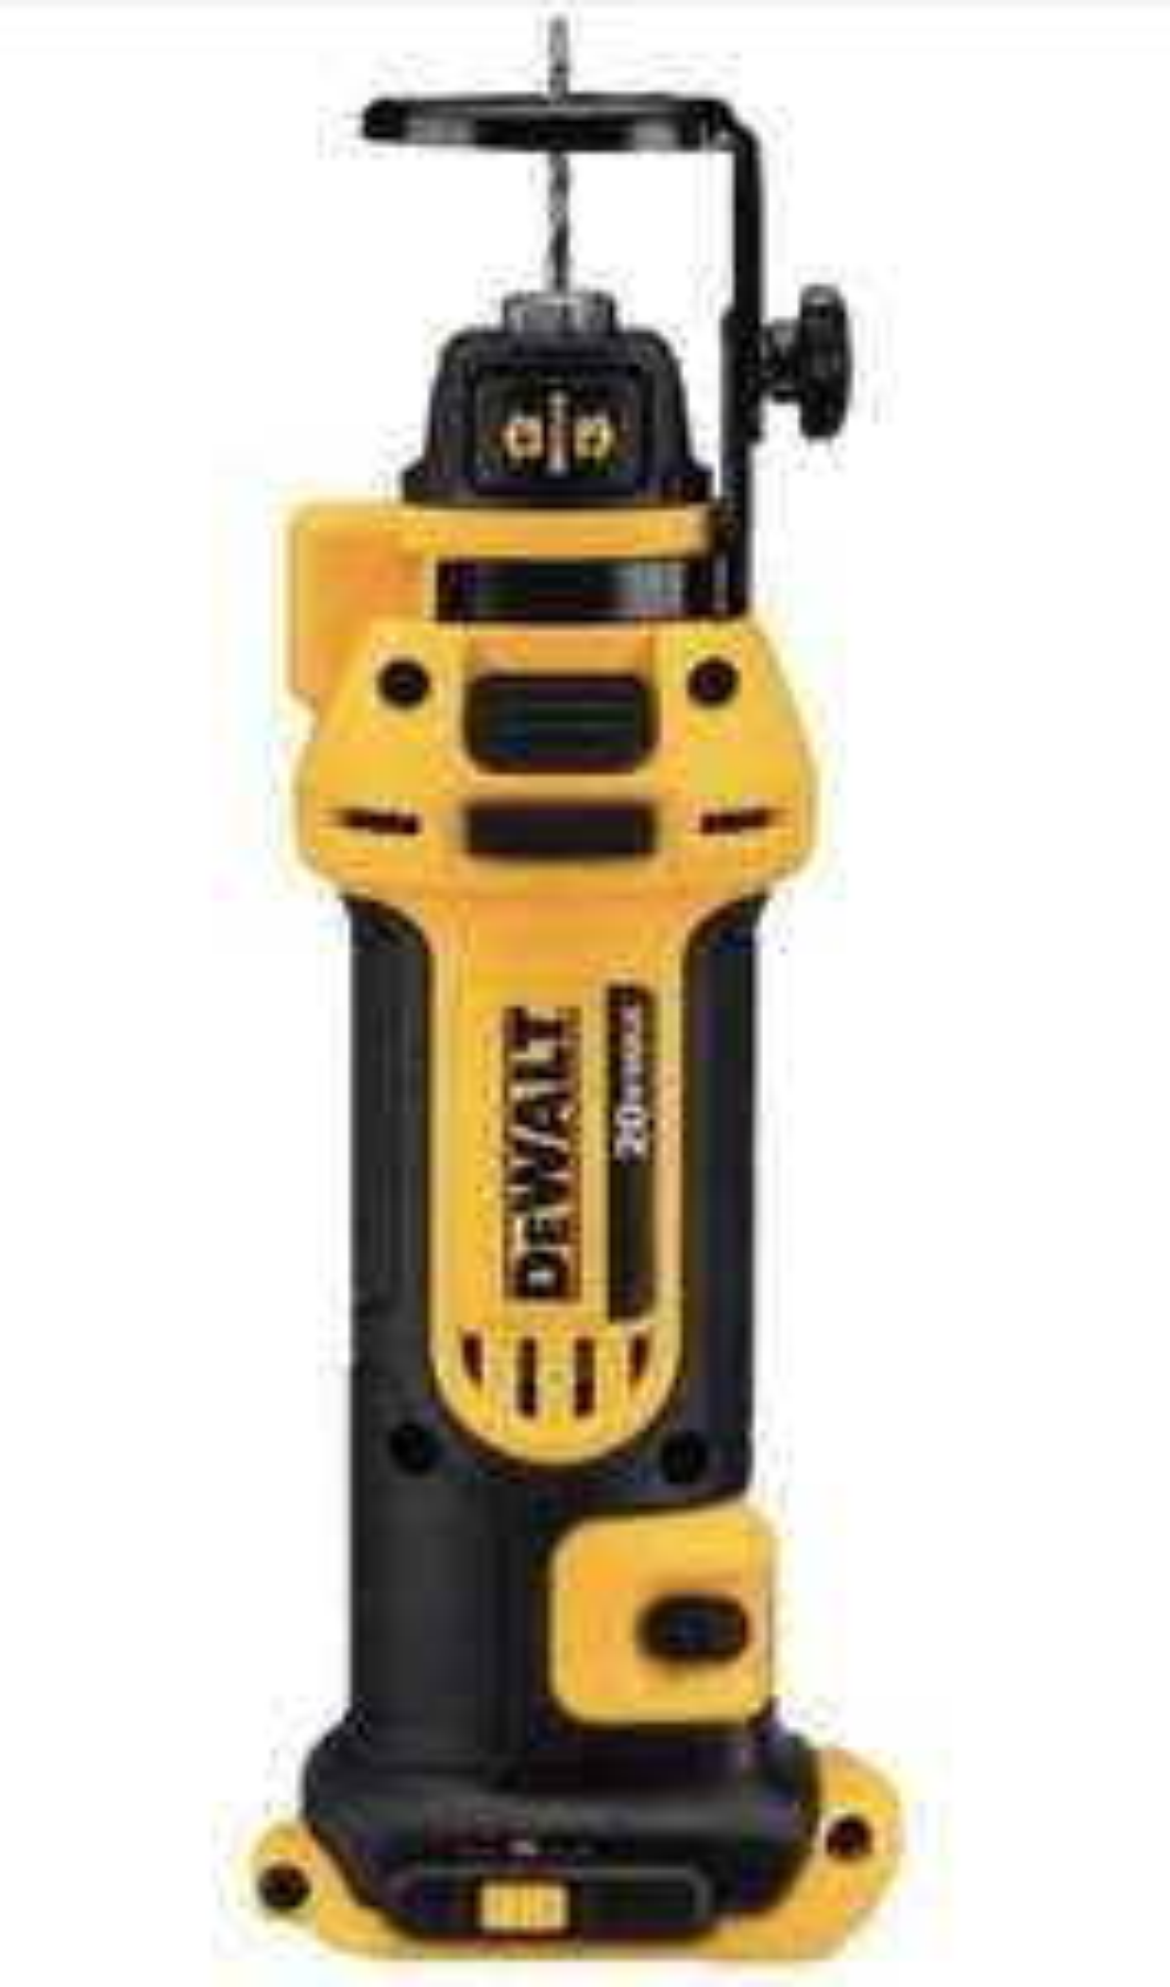 Dewalt DCS551B 20V Max Drywall Cut-Out Tool, 20 W, 20 V, Black Yelow £92.17 at Amazon